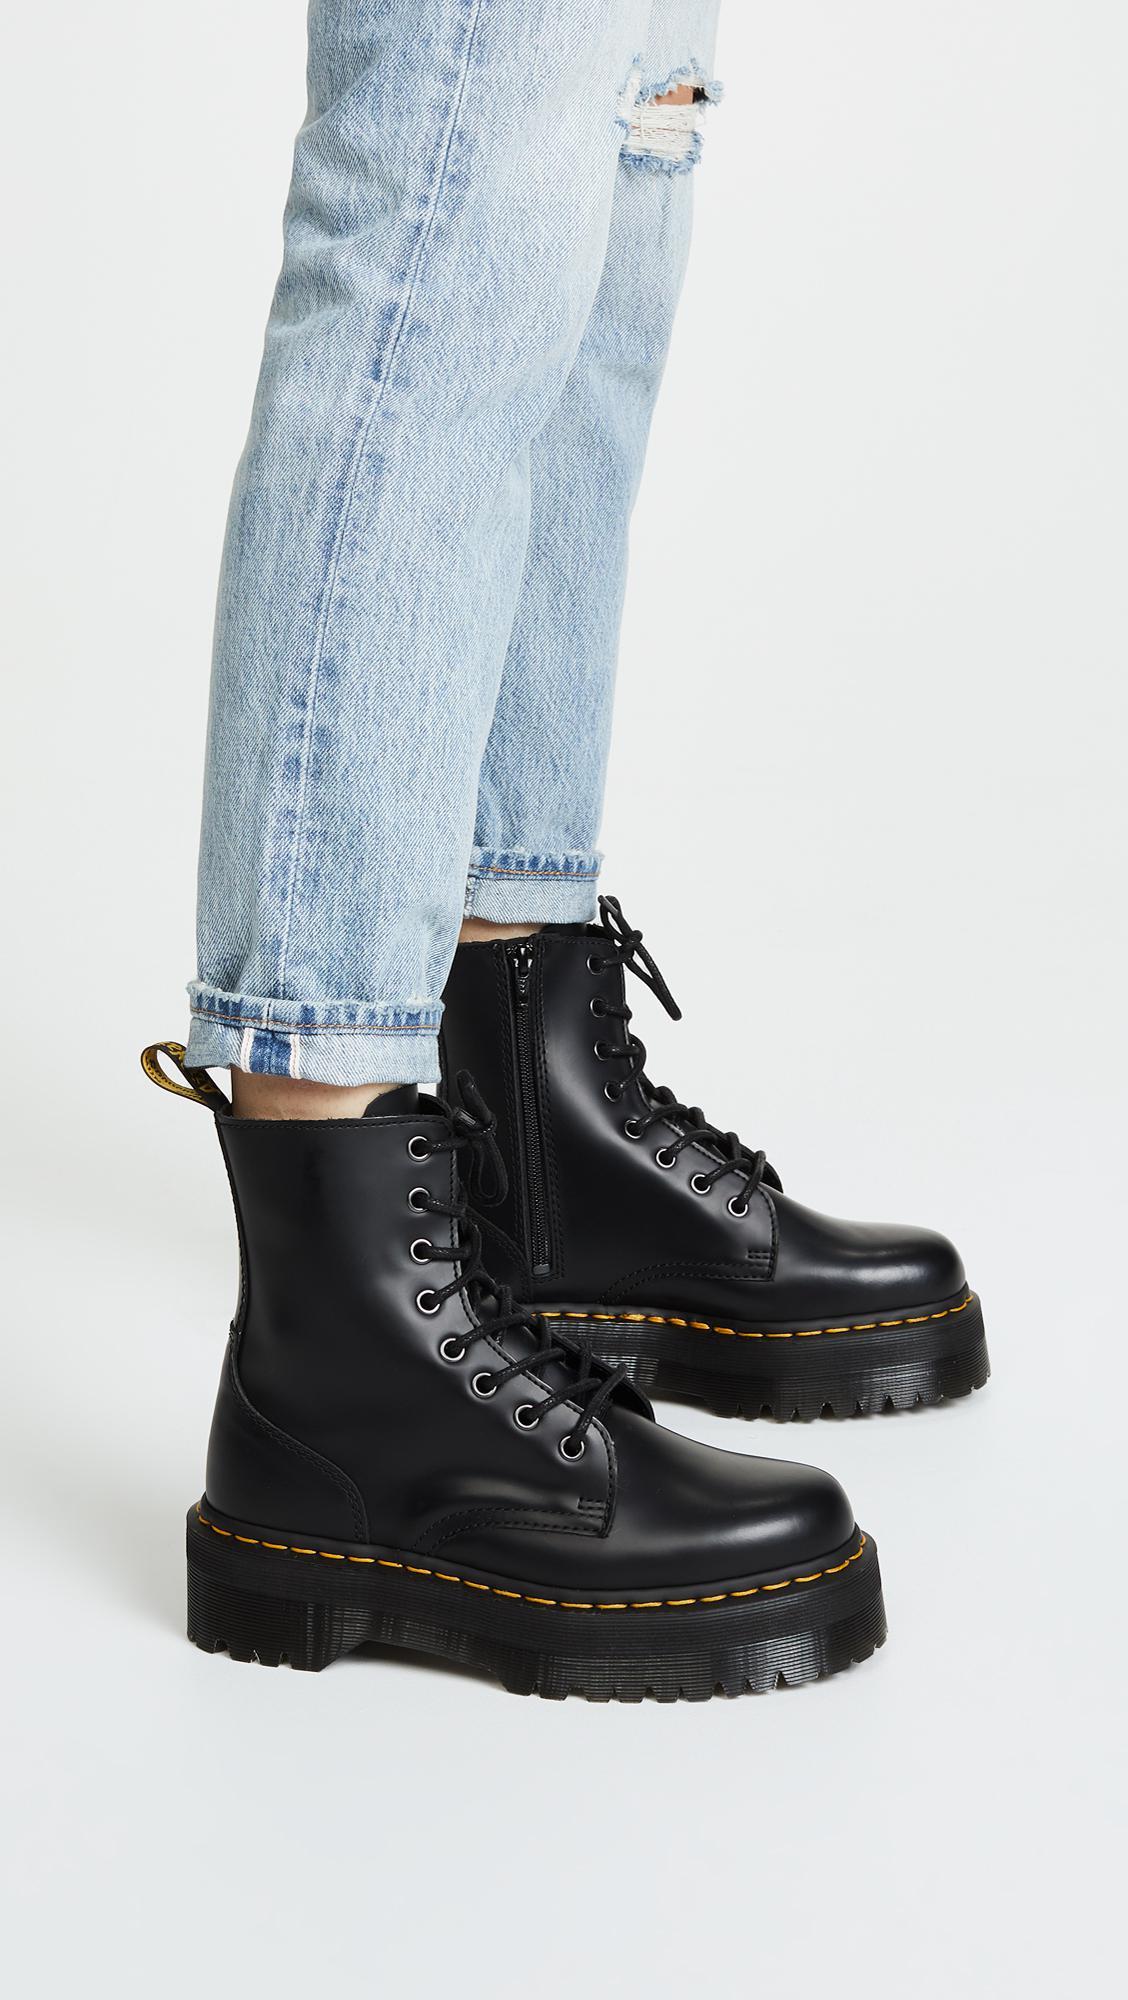 12b263405aec27 Dr. Martens - Black Jadon 8 Eye Boots - Lyst. View fullscreen